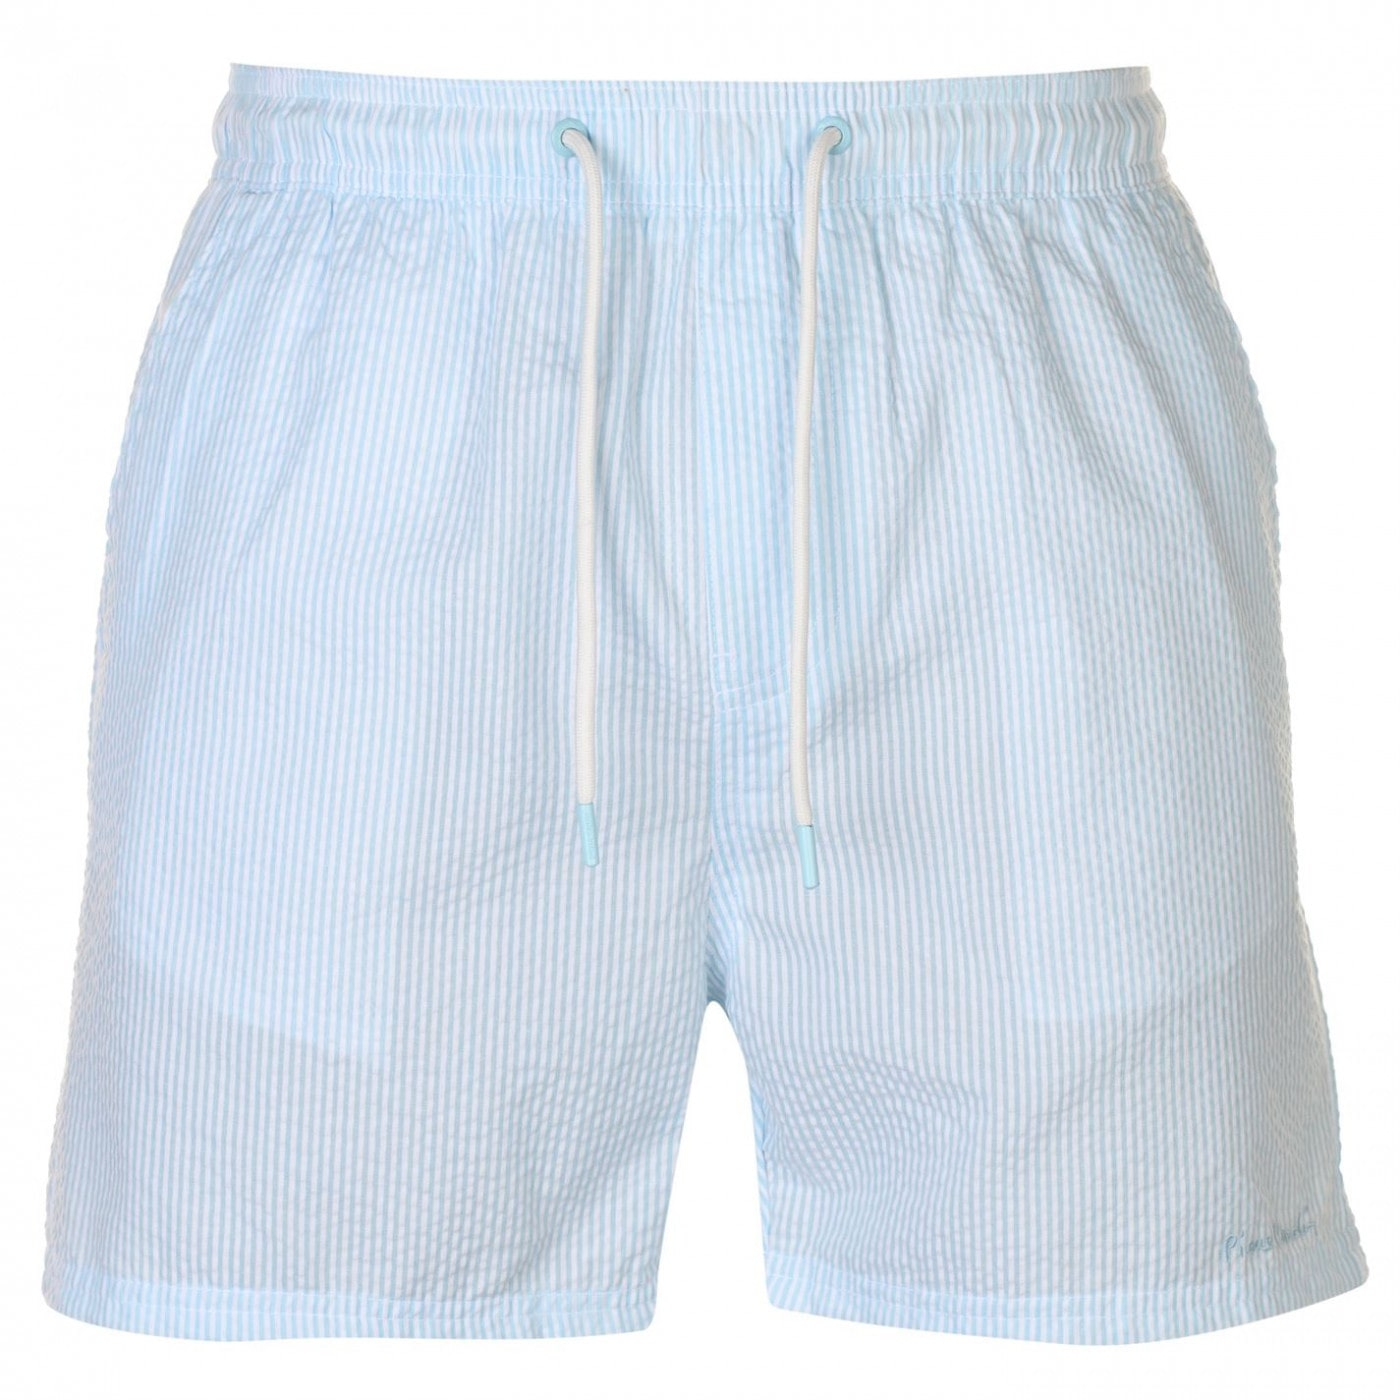 Men's swim shorts Pierre Cardin Seersucker